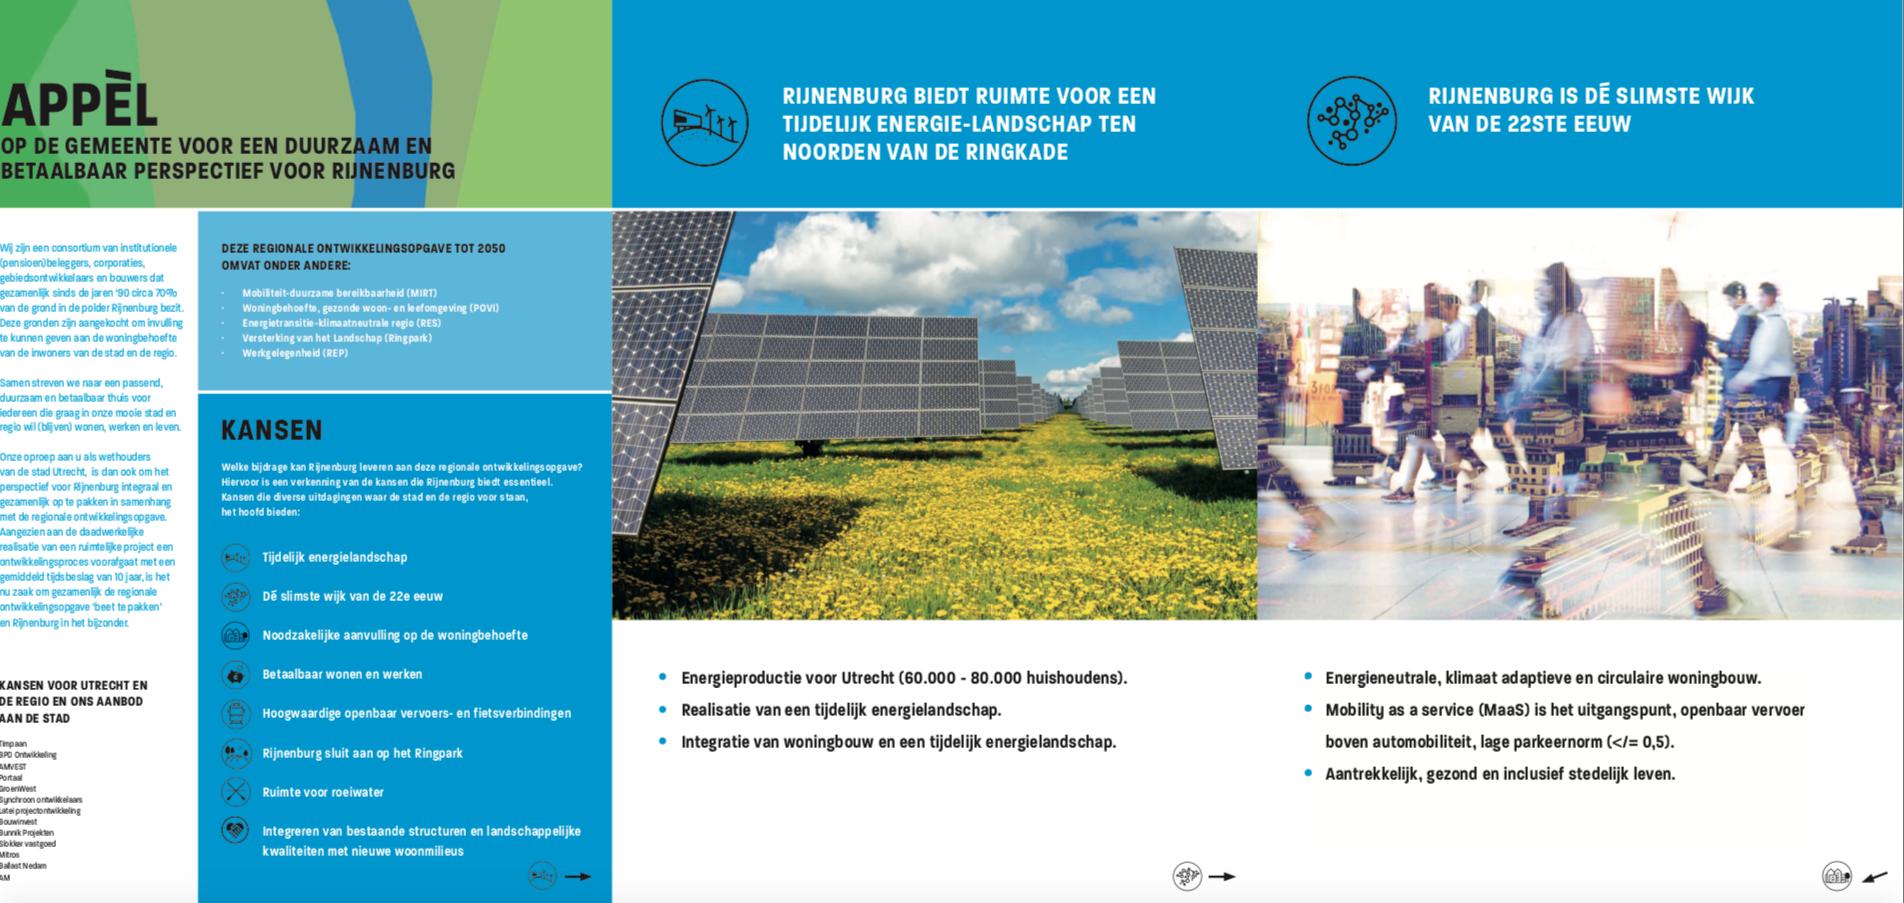 Fragment uit PDF Appèl Rijnenburg